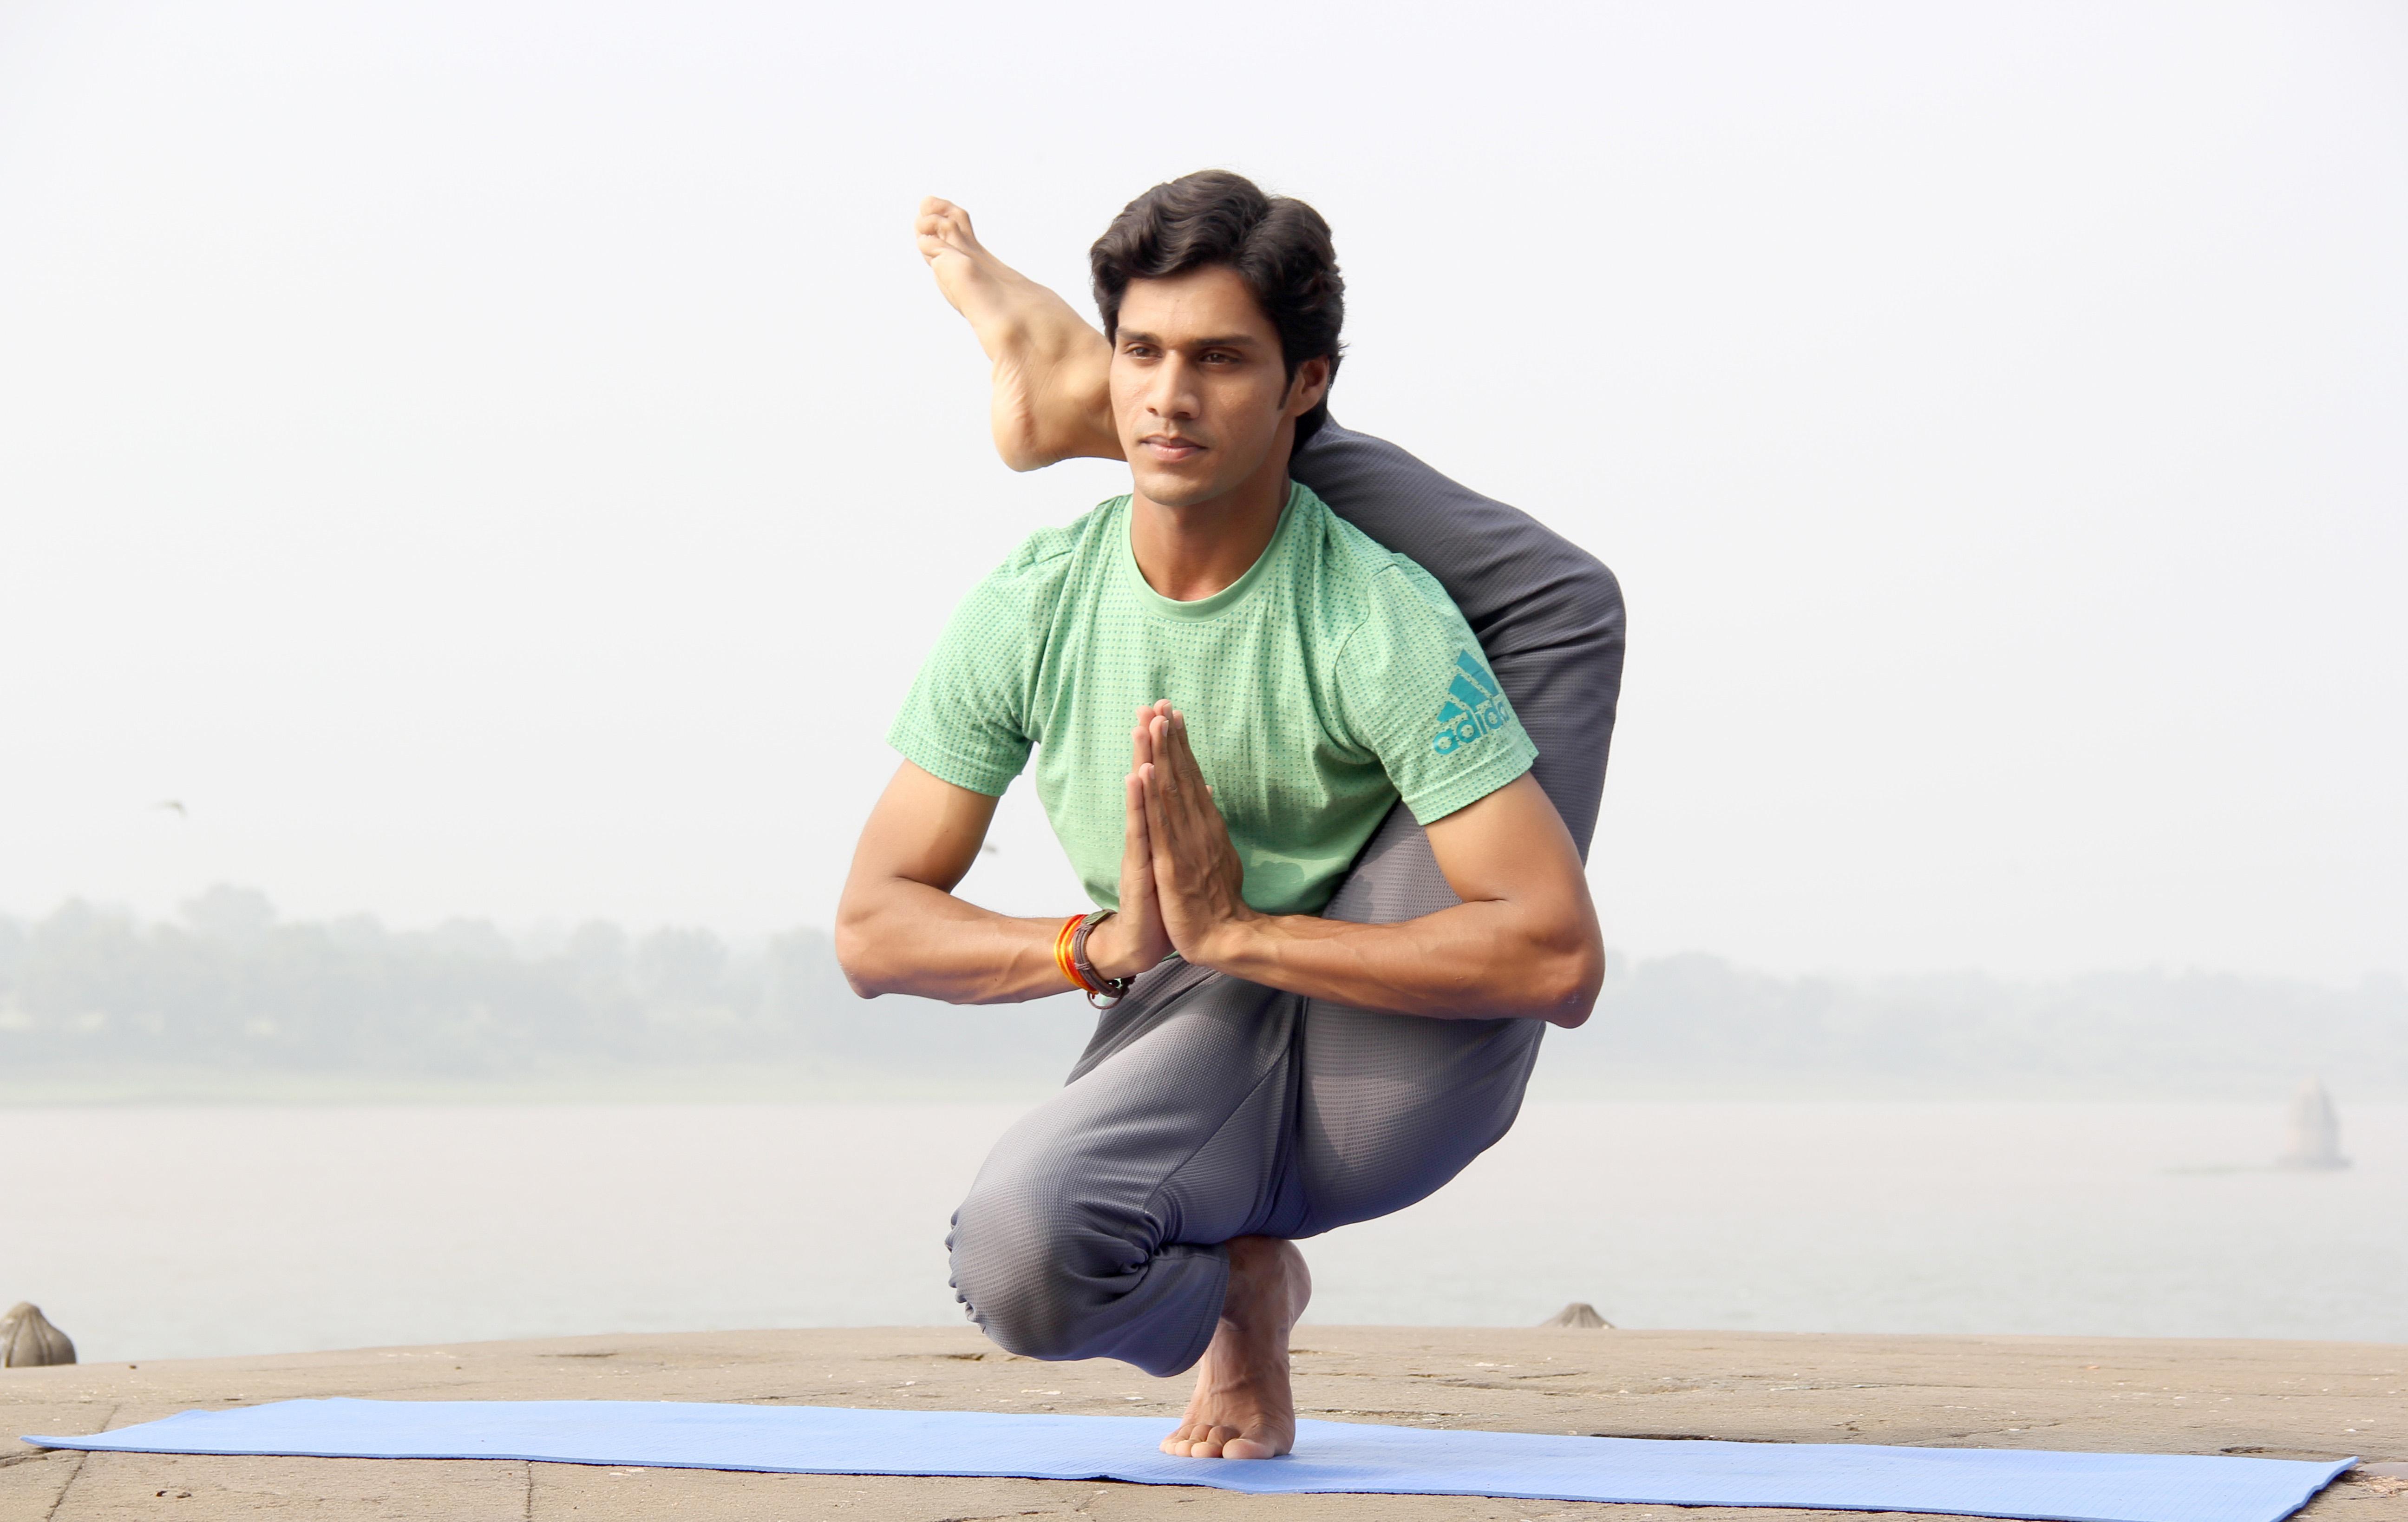 Man in Extreme Yoga Pose